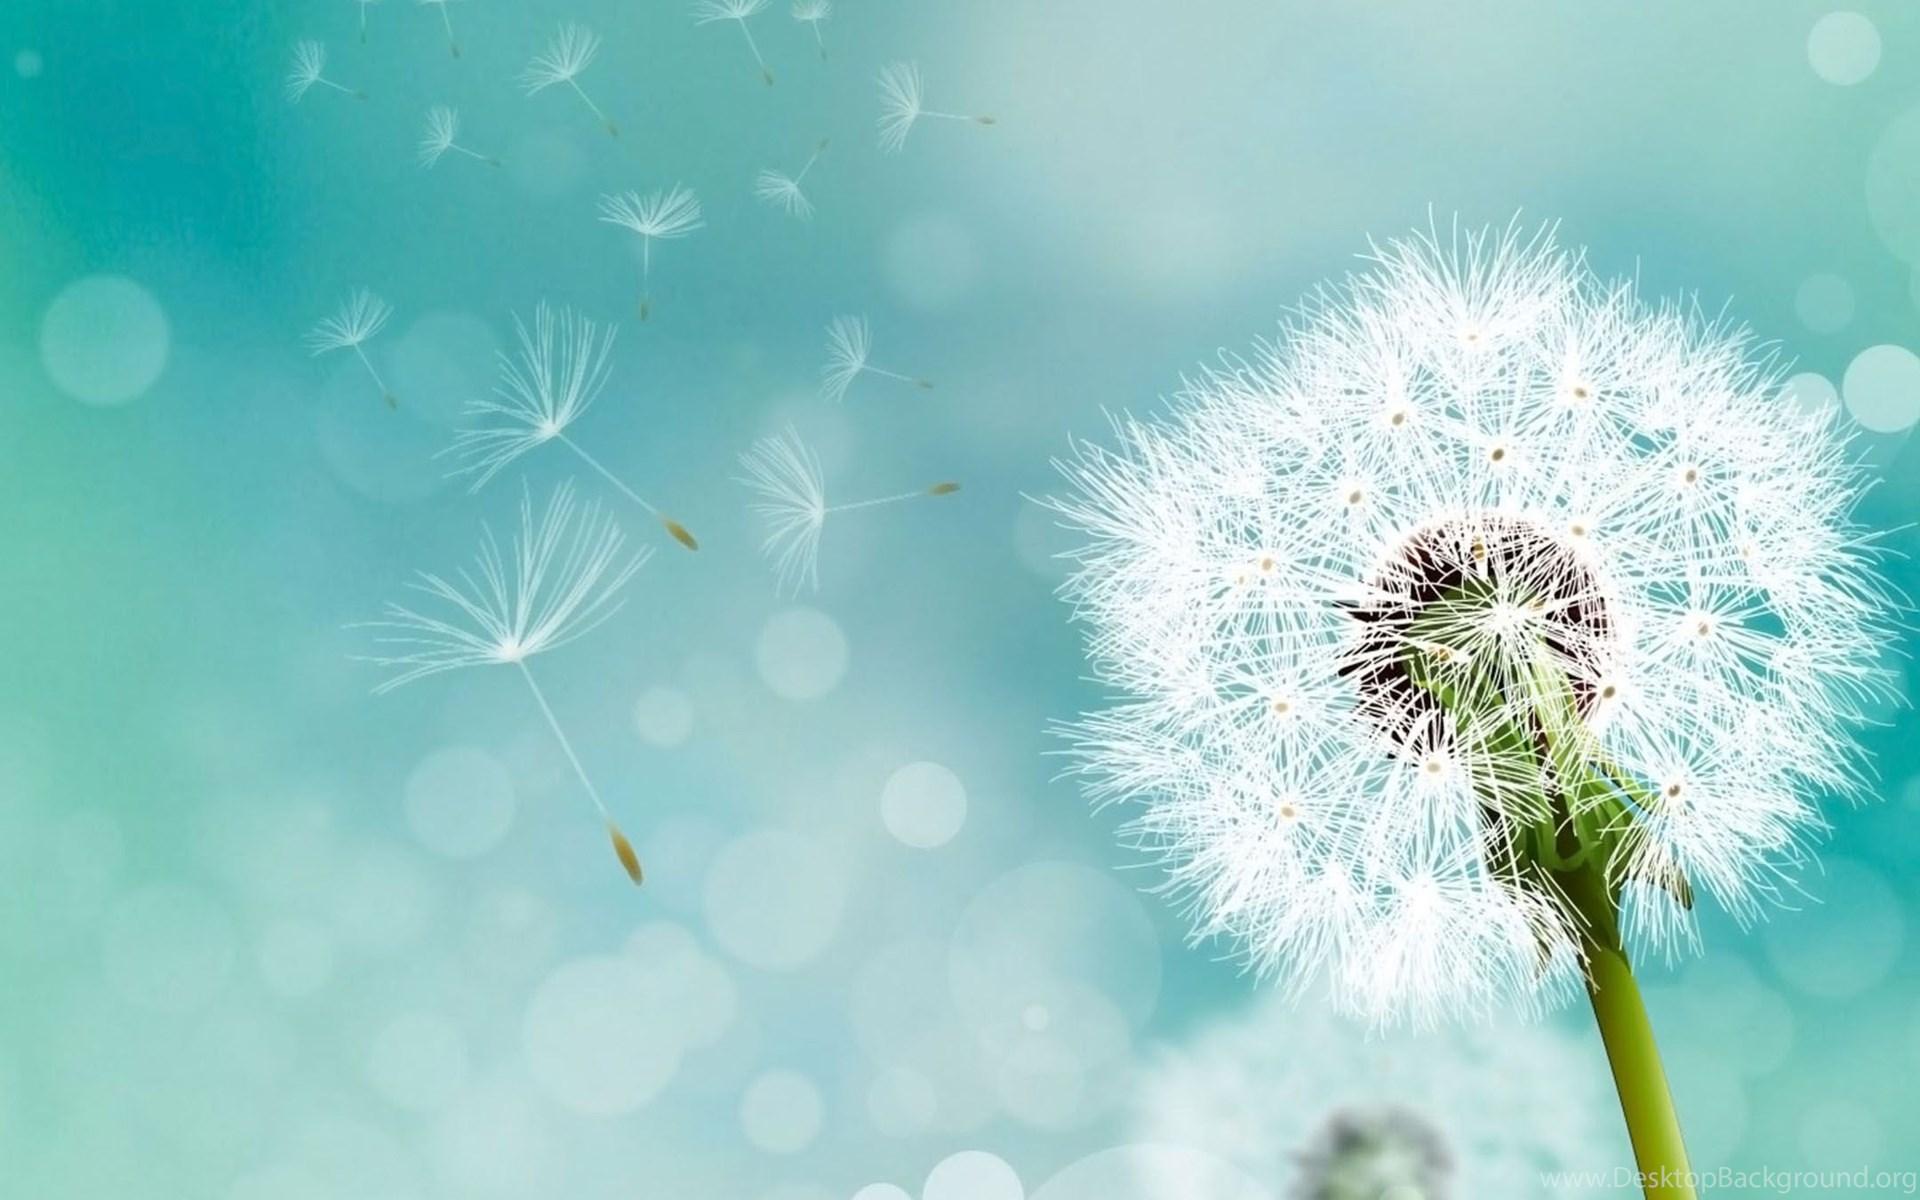 2160x1920 Wallpaper Appsapk 468: Dandelion Backgrounds 2160x1920 Samsung Galaxy S4